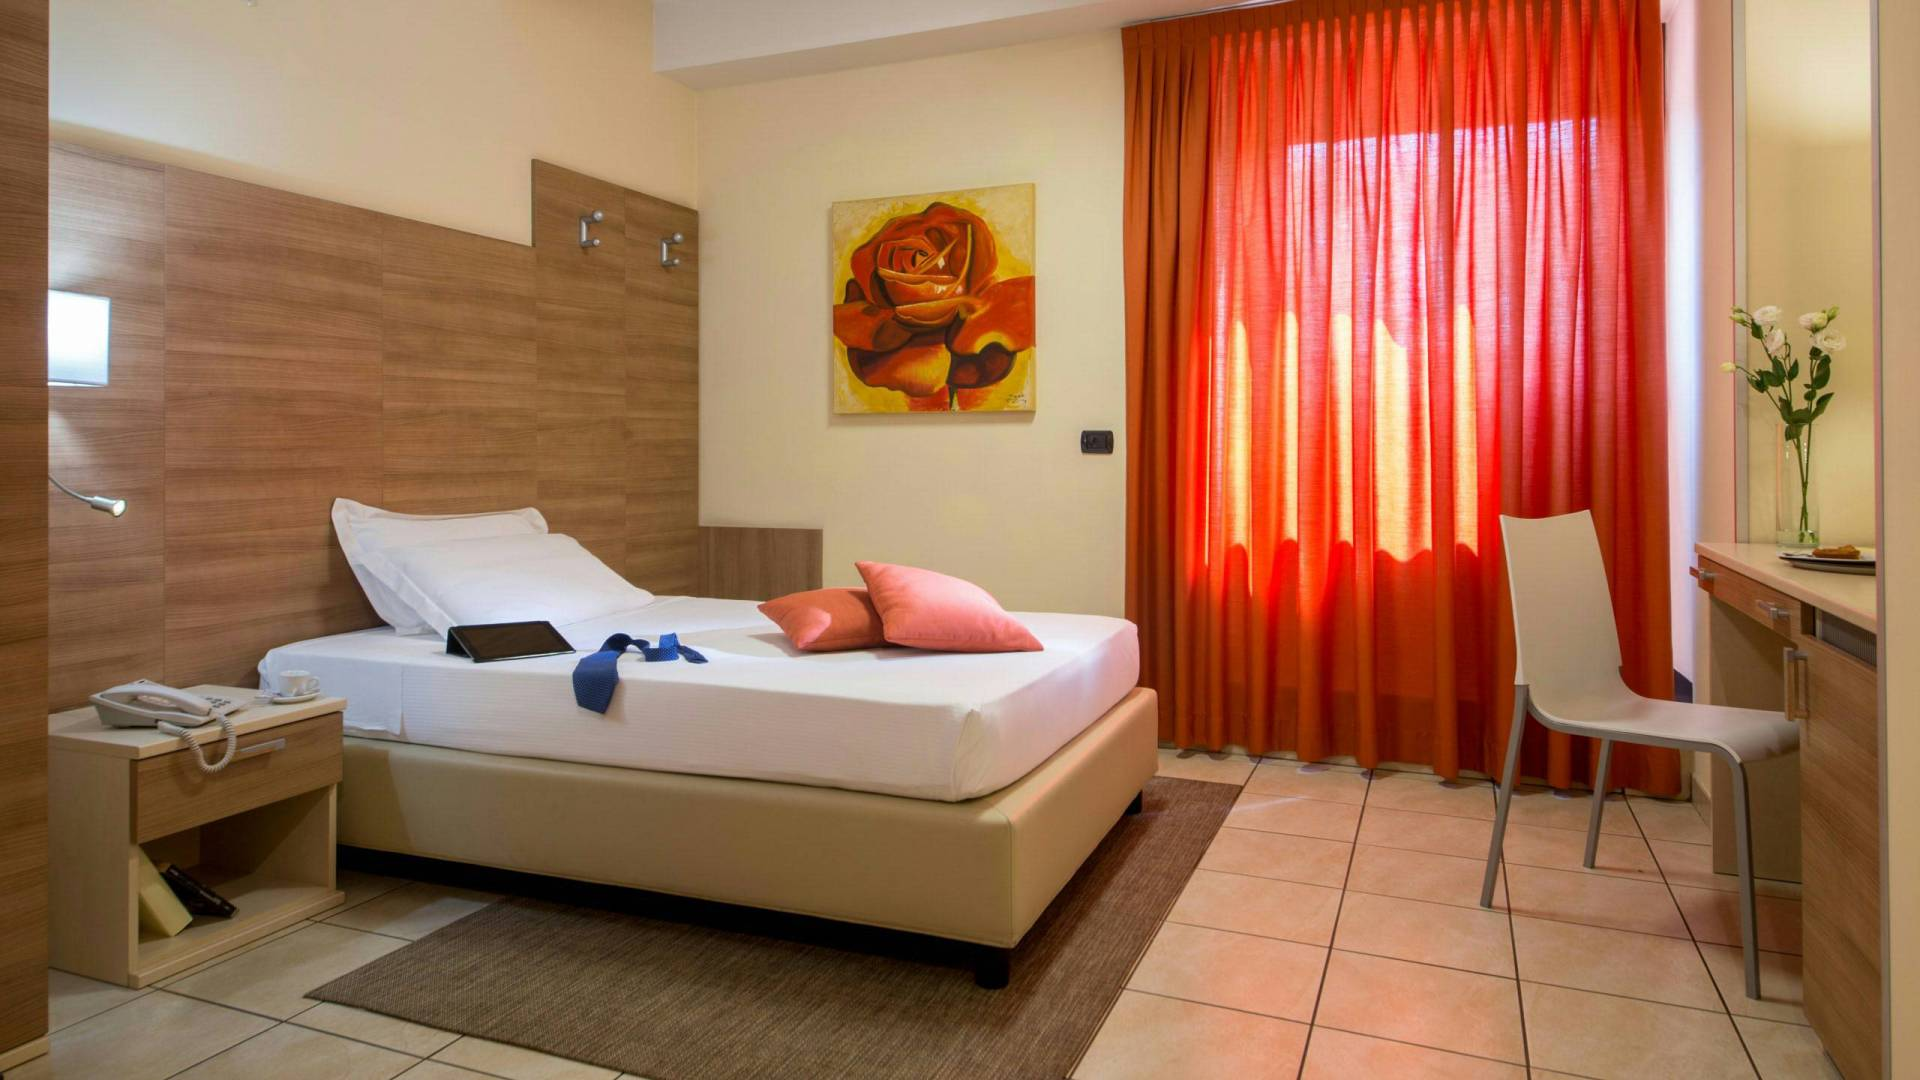 Domidea-Business-Hotel-standard-2020-camere-01